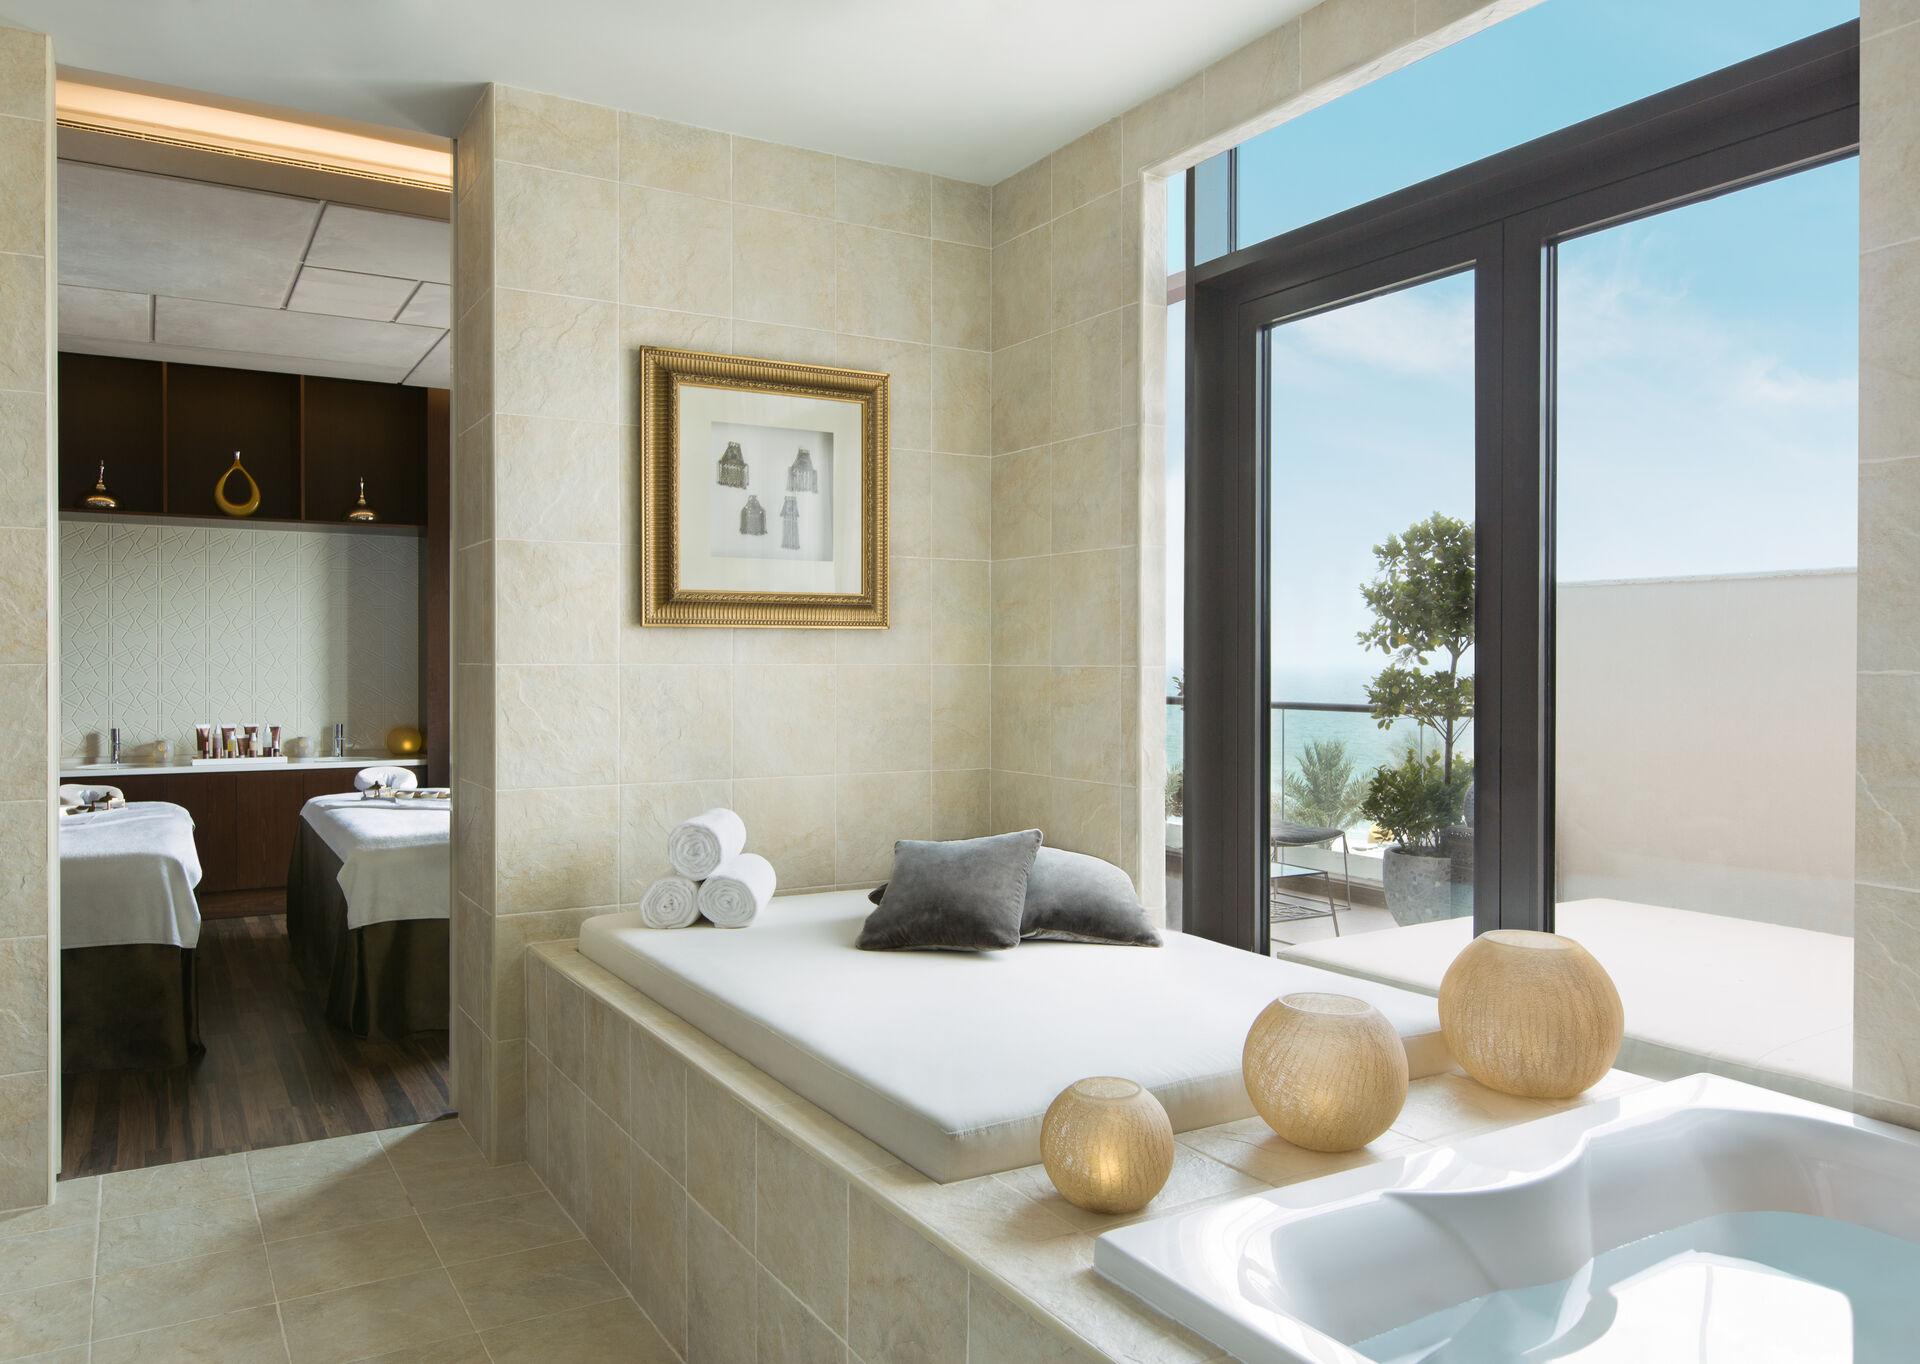 https://cms.satur.sk/data/imgs/tour_image/orig/goco-spa-ajman-treatment-room-bath-1-1960355.jpg